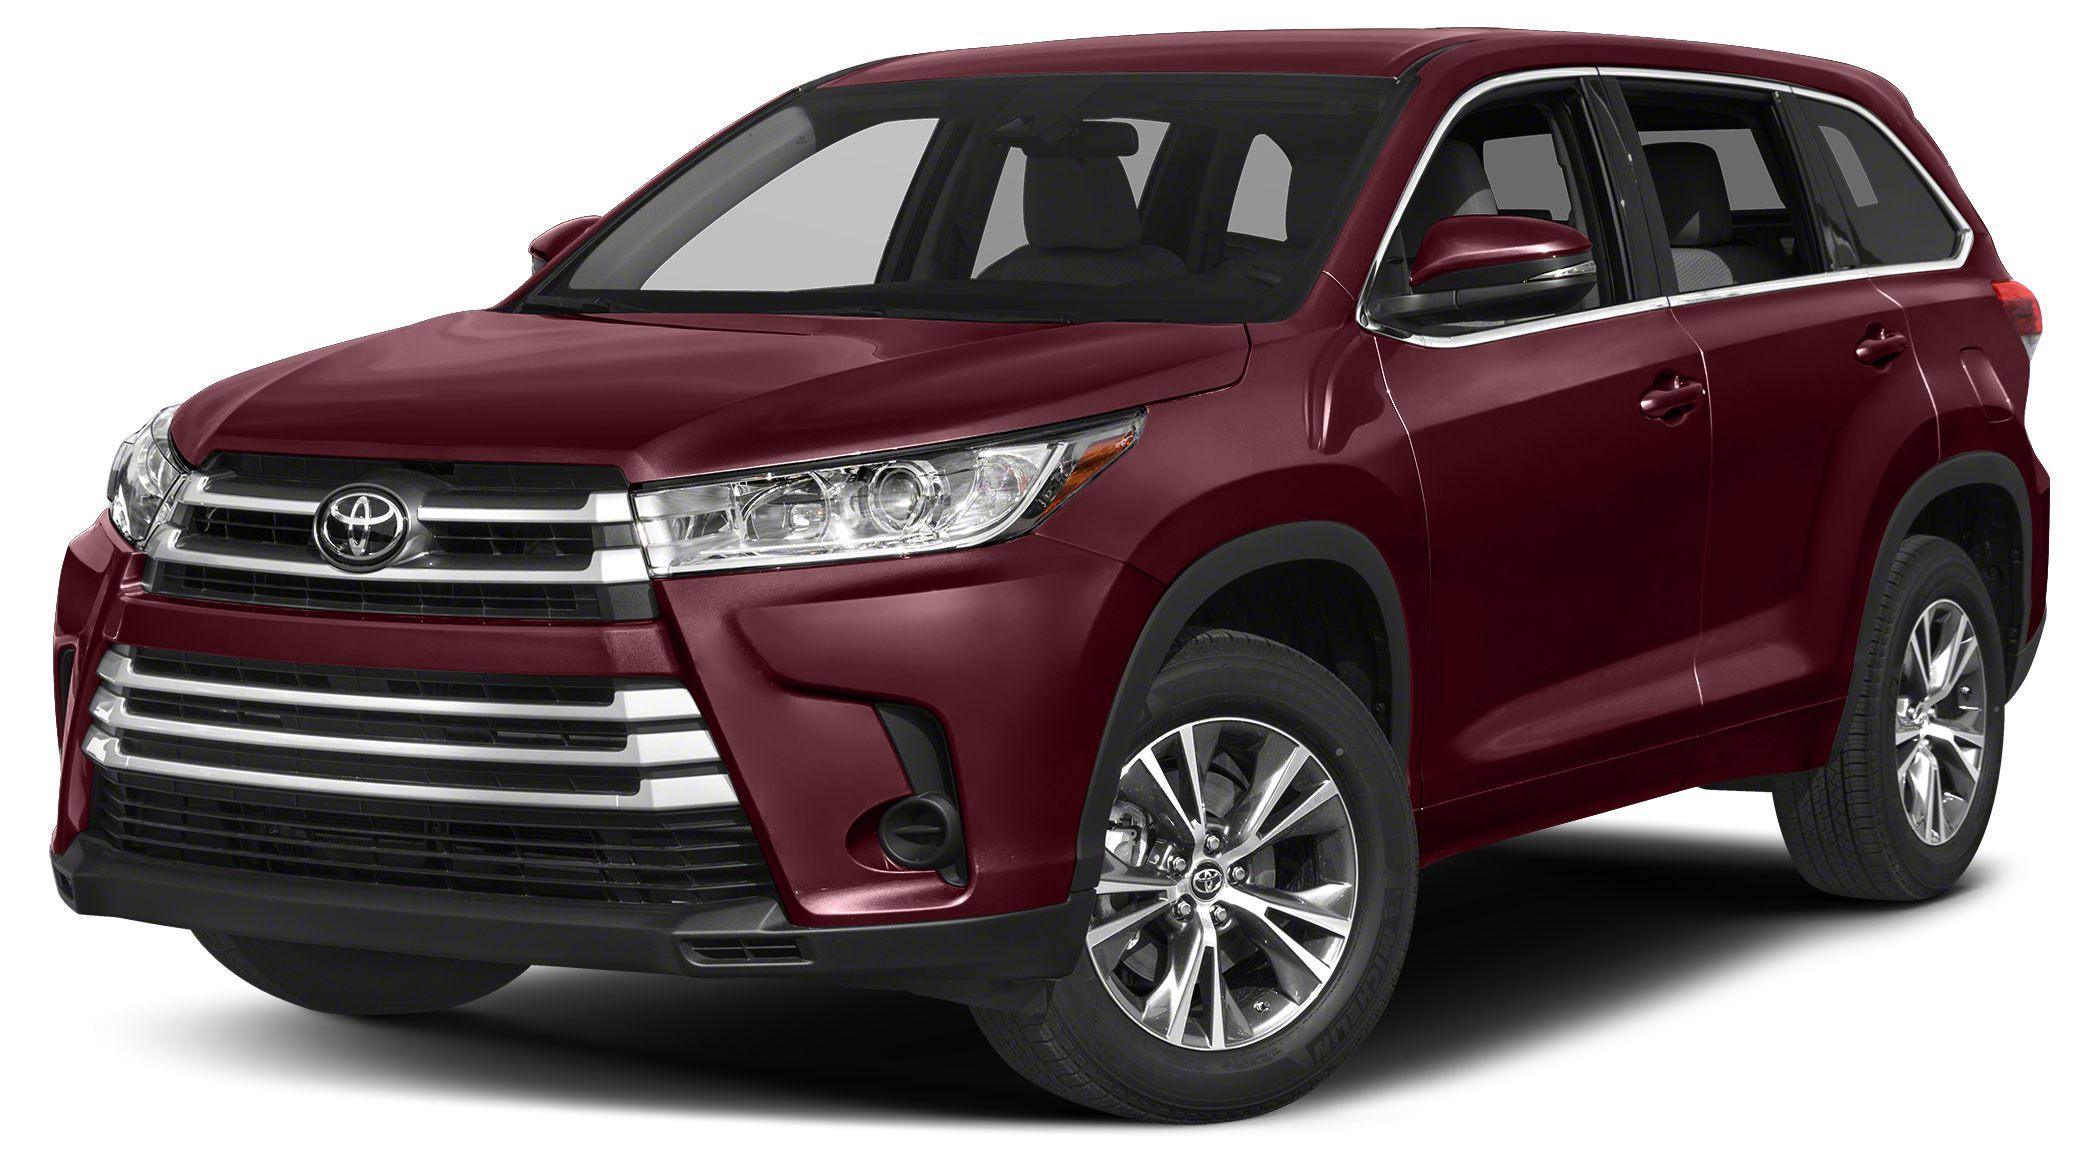 2018 Toyota Highlander LE This 2018 Toyota Highlander 4dr LE features a 35L V6 Cylinder 6cyl Gaso